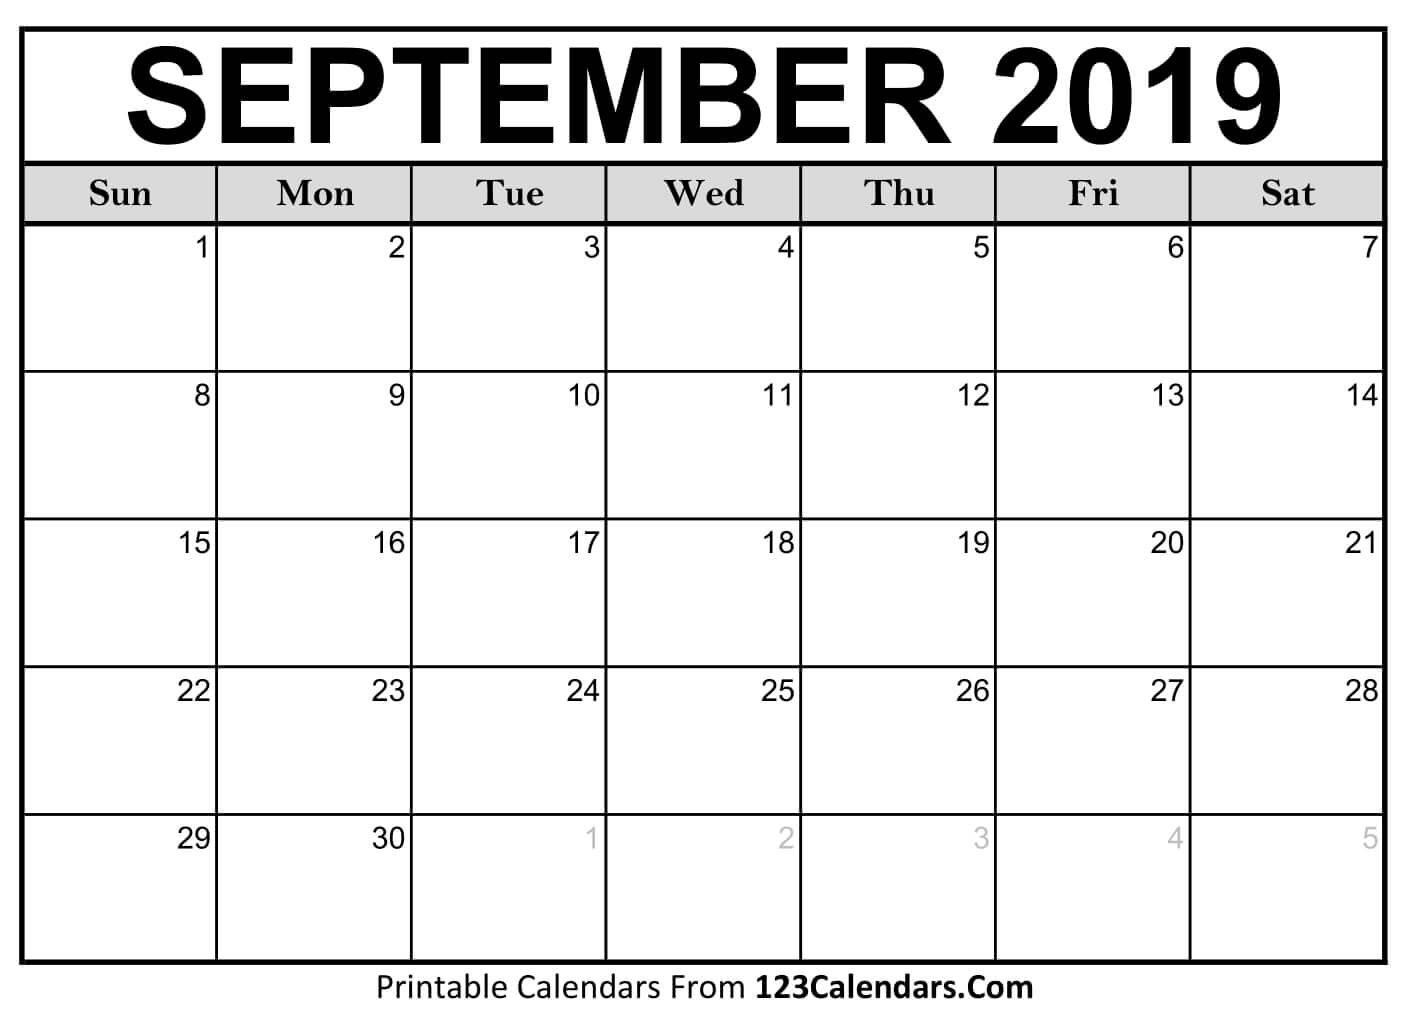 Printable September 2019 Calendar Templates - 123Calendars Calendar 2019 September